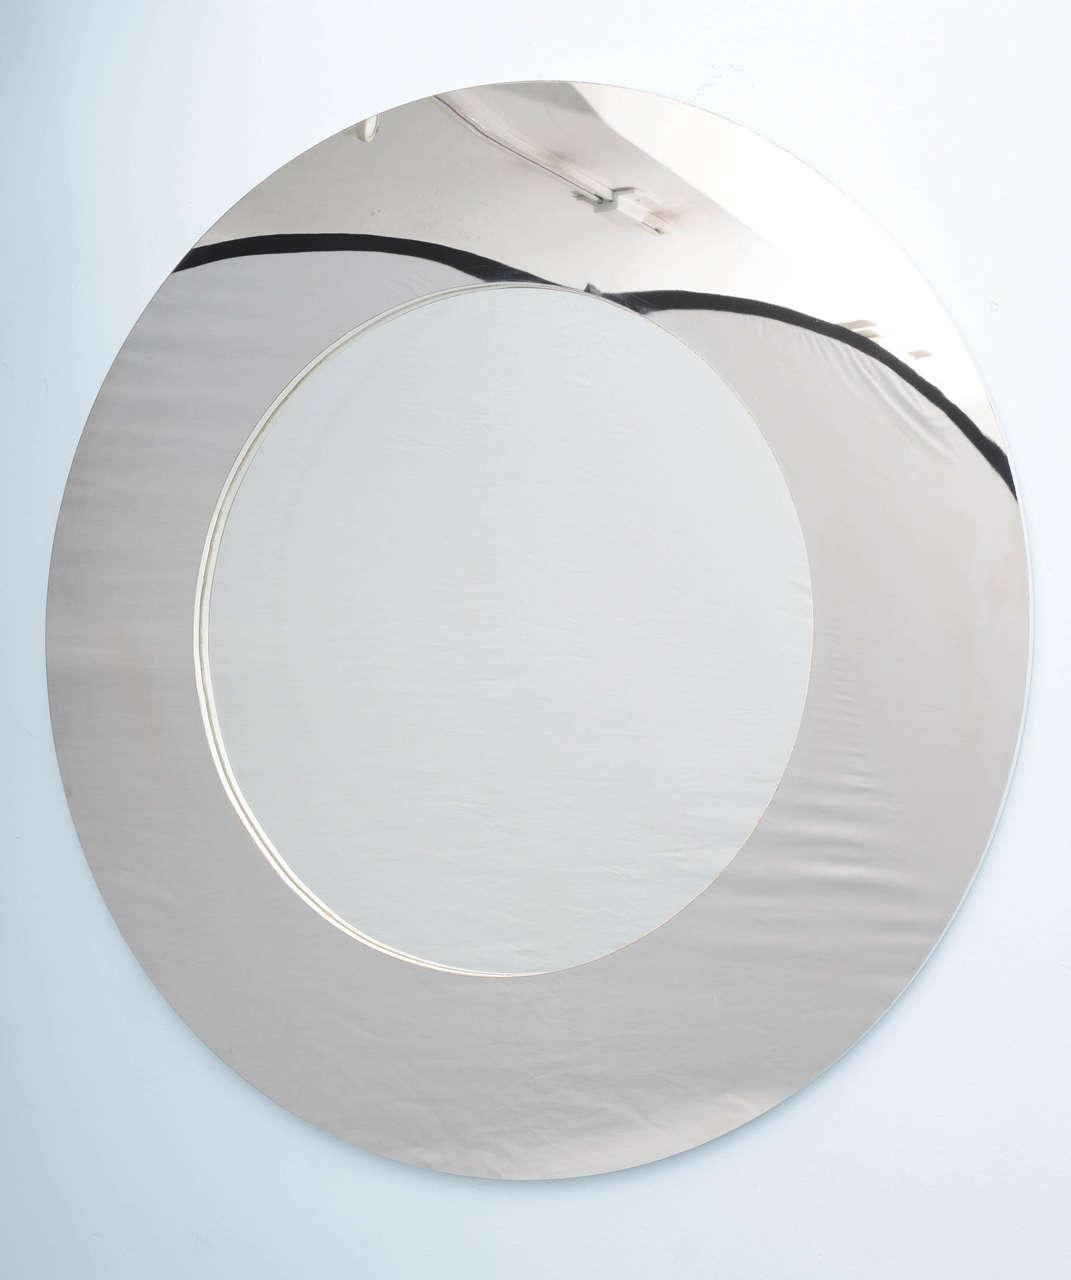 Modern Midcentury Minimalist Stainless Steel Mirror At 1stdibs